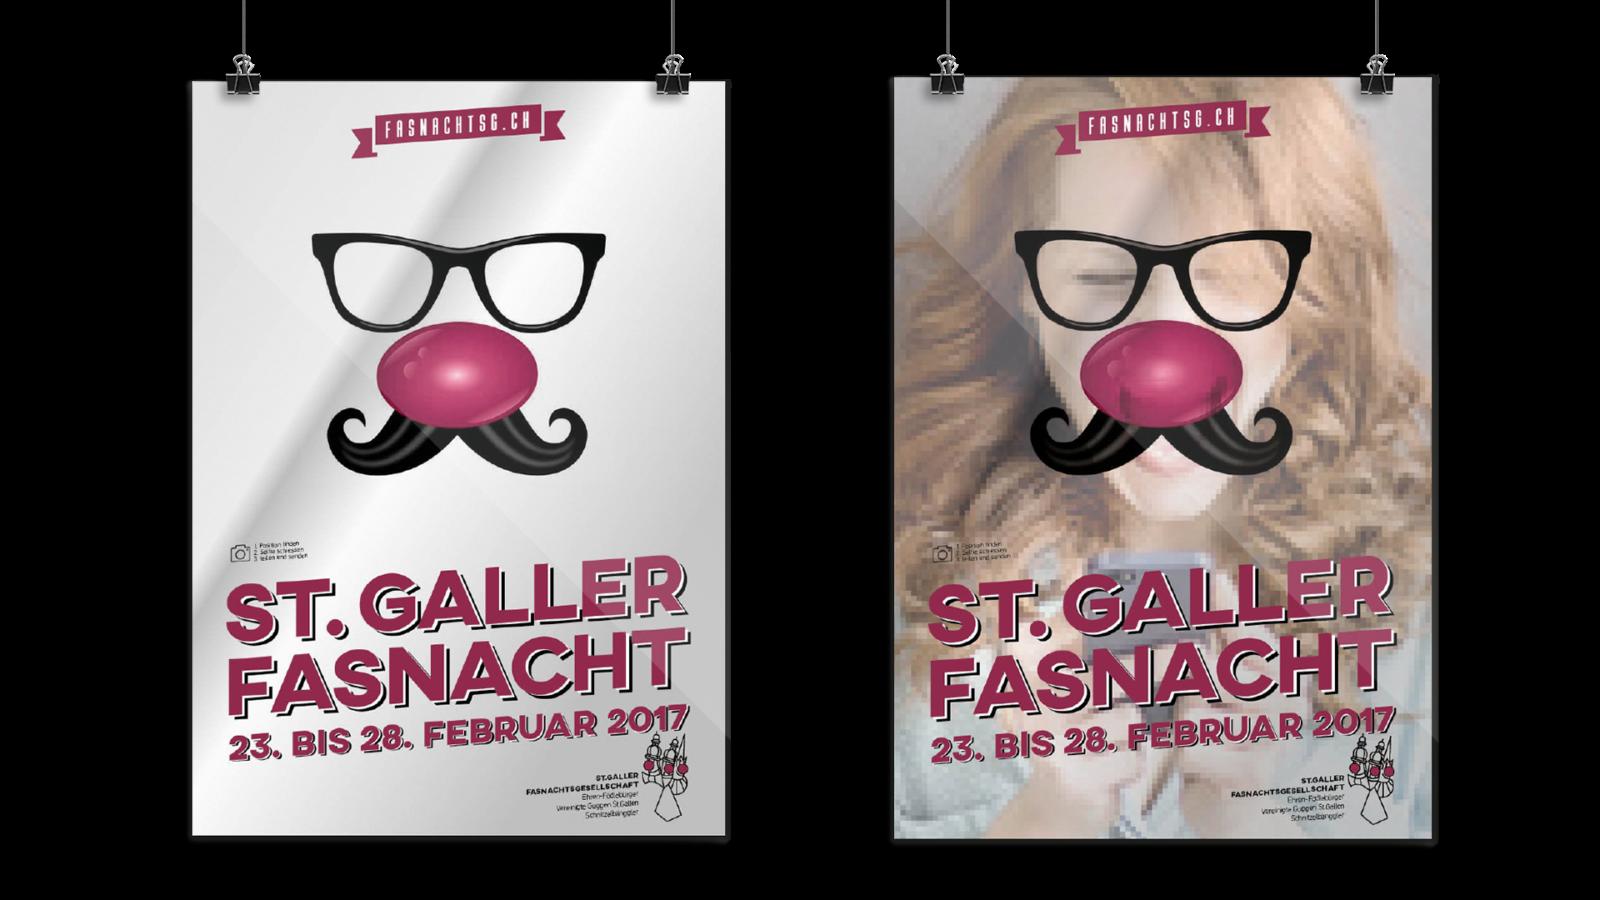 ST. GALLER FASNACHT –Fasnachtsplakat 2017